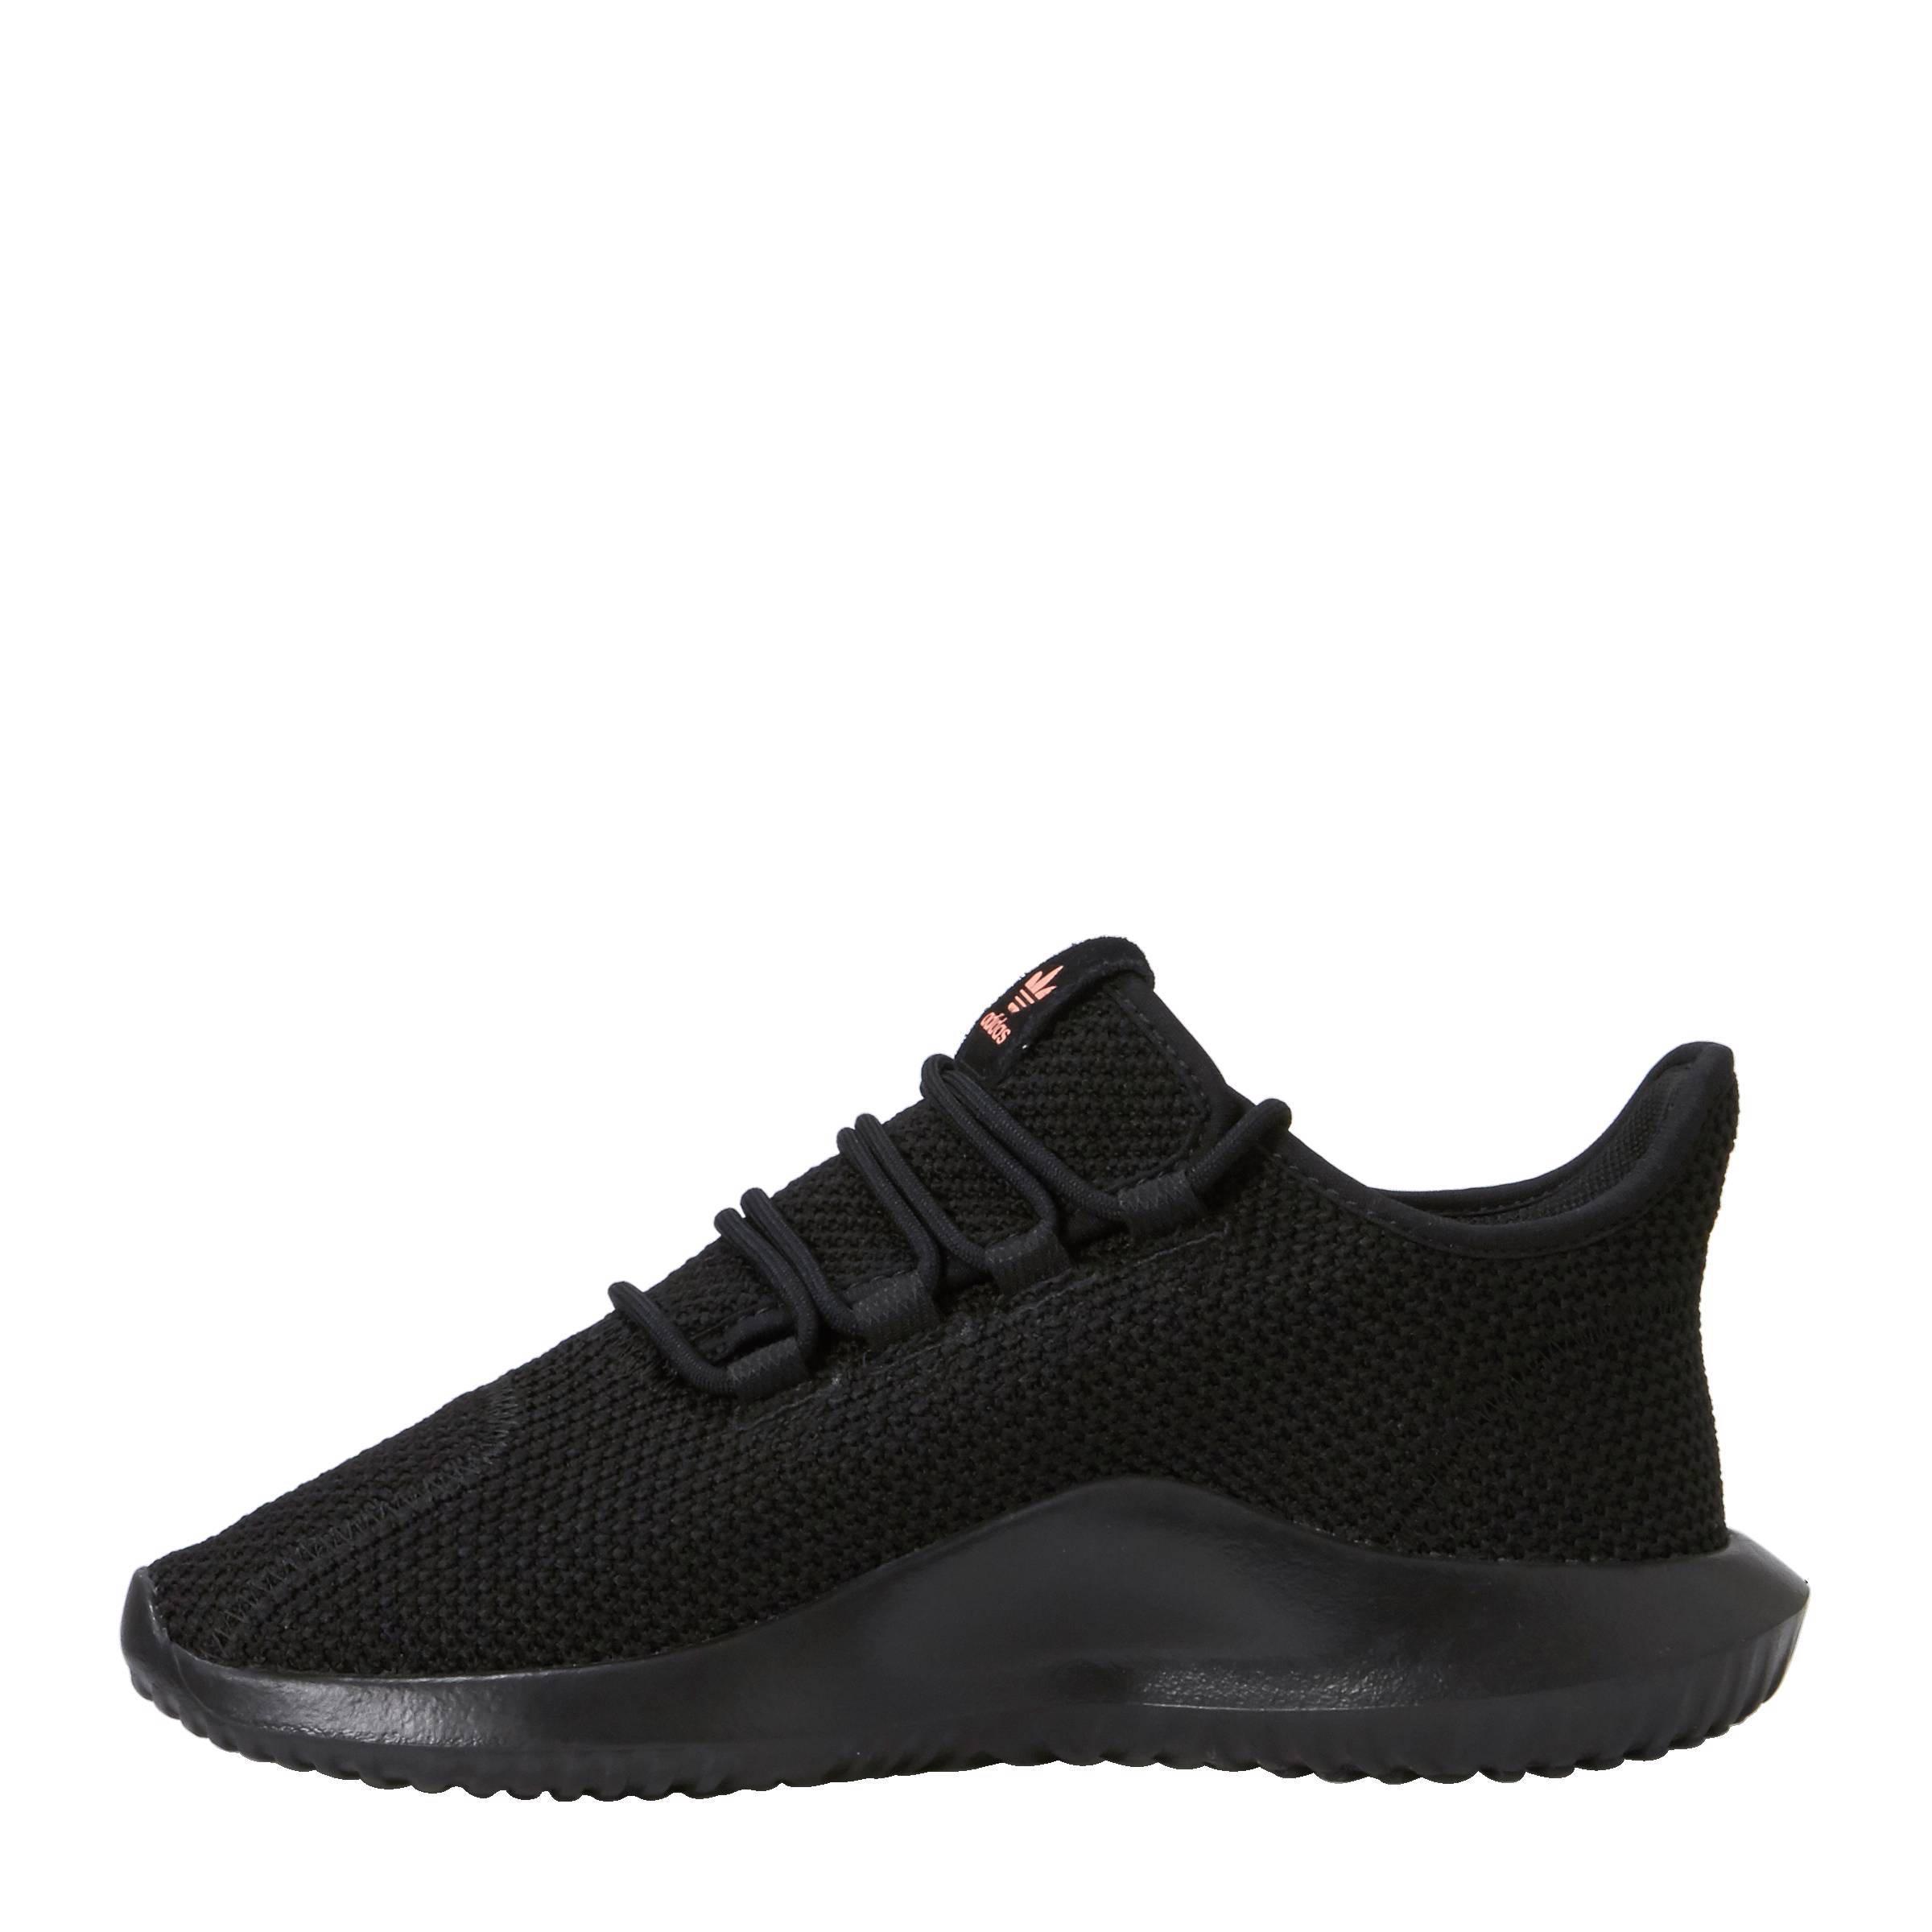 adidas tubular shadow dames sale